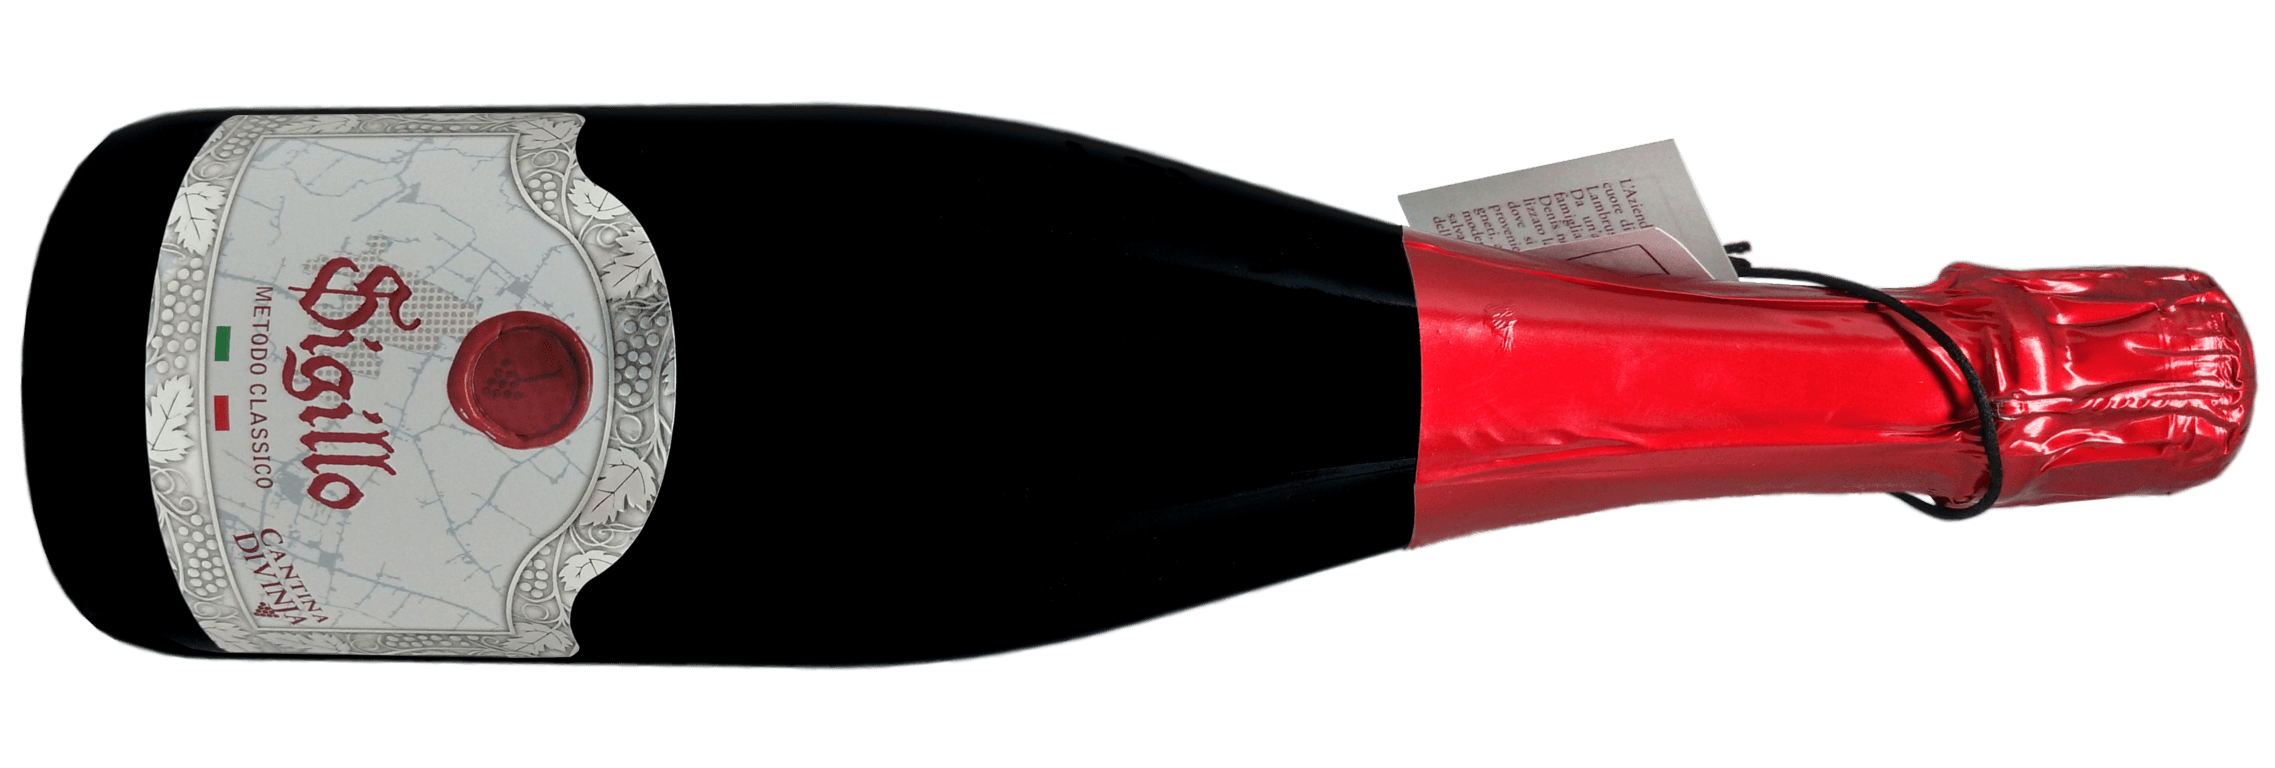 Bottiglia Sigillo cantina divinja homepage